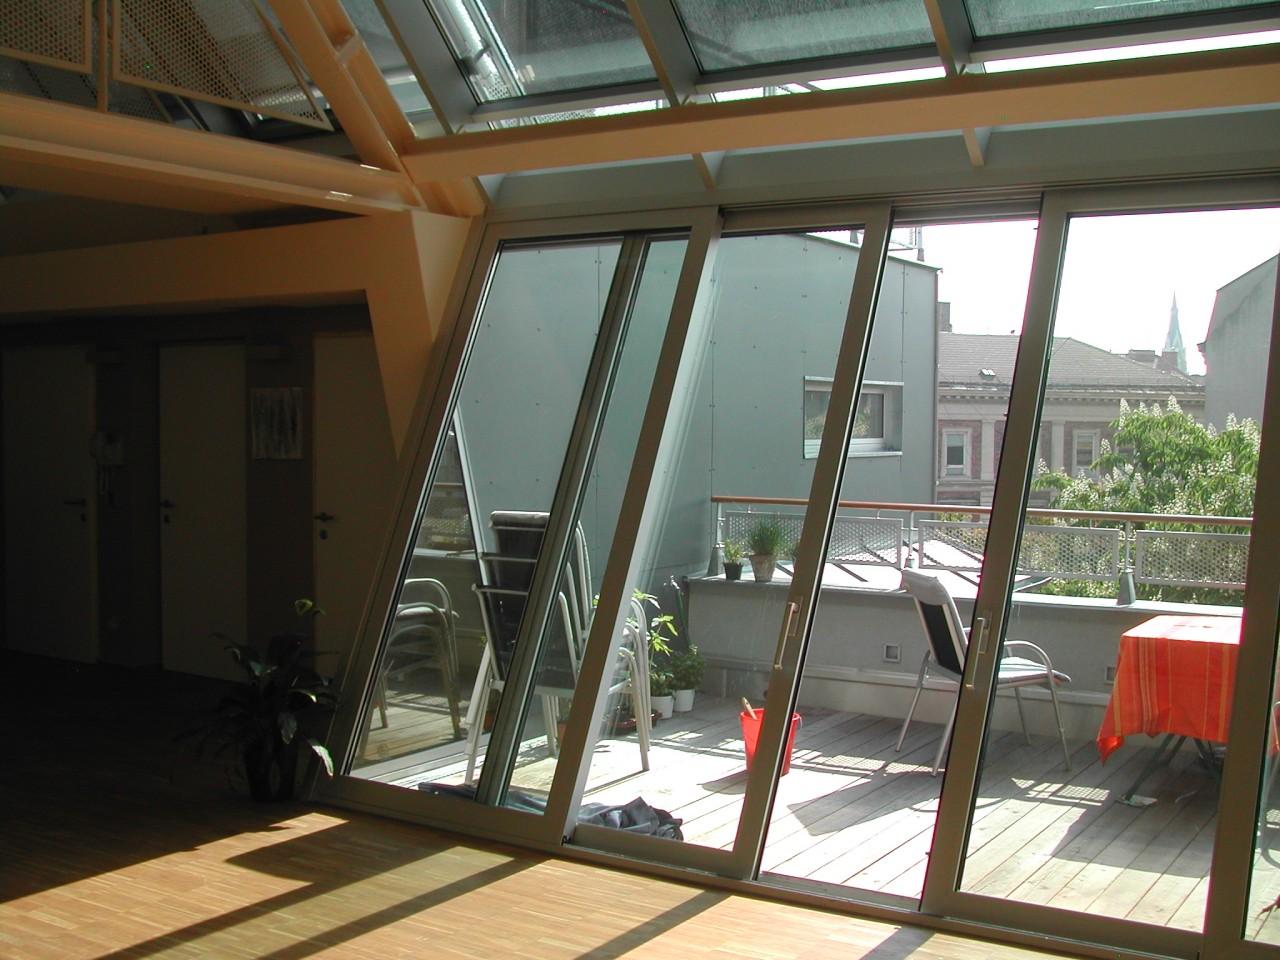 liegler takeh architekten projekt whs59 29 liegler takeh architekten. Black Bedroom Furniture Sets. Home Design Ideas